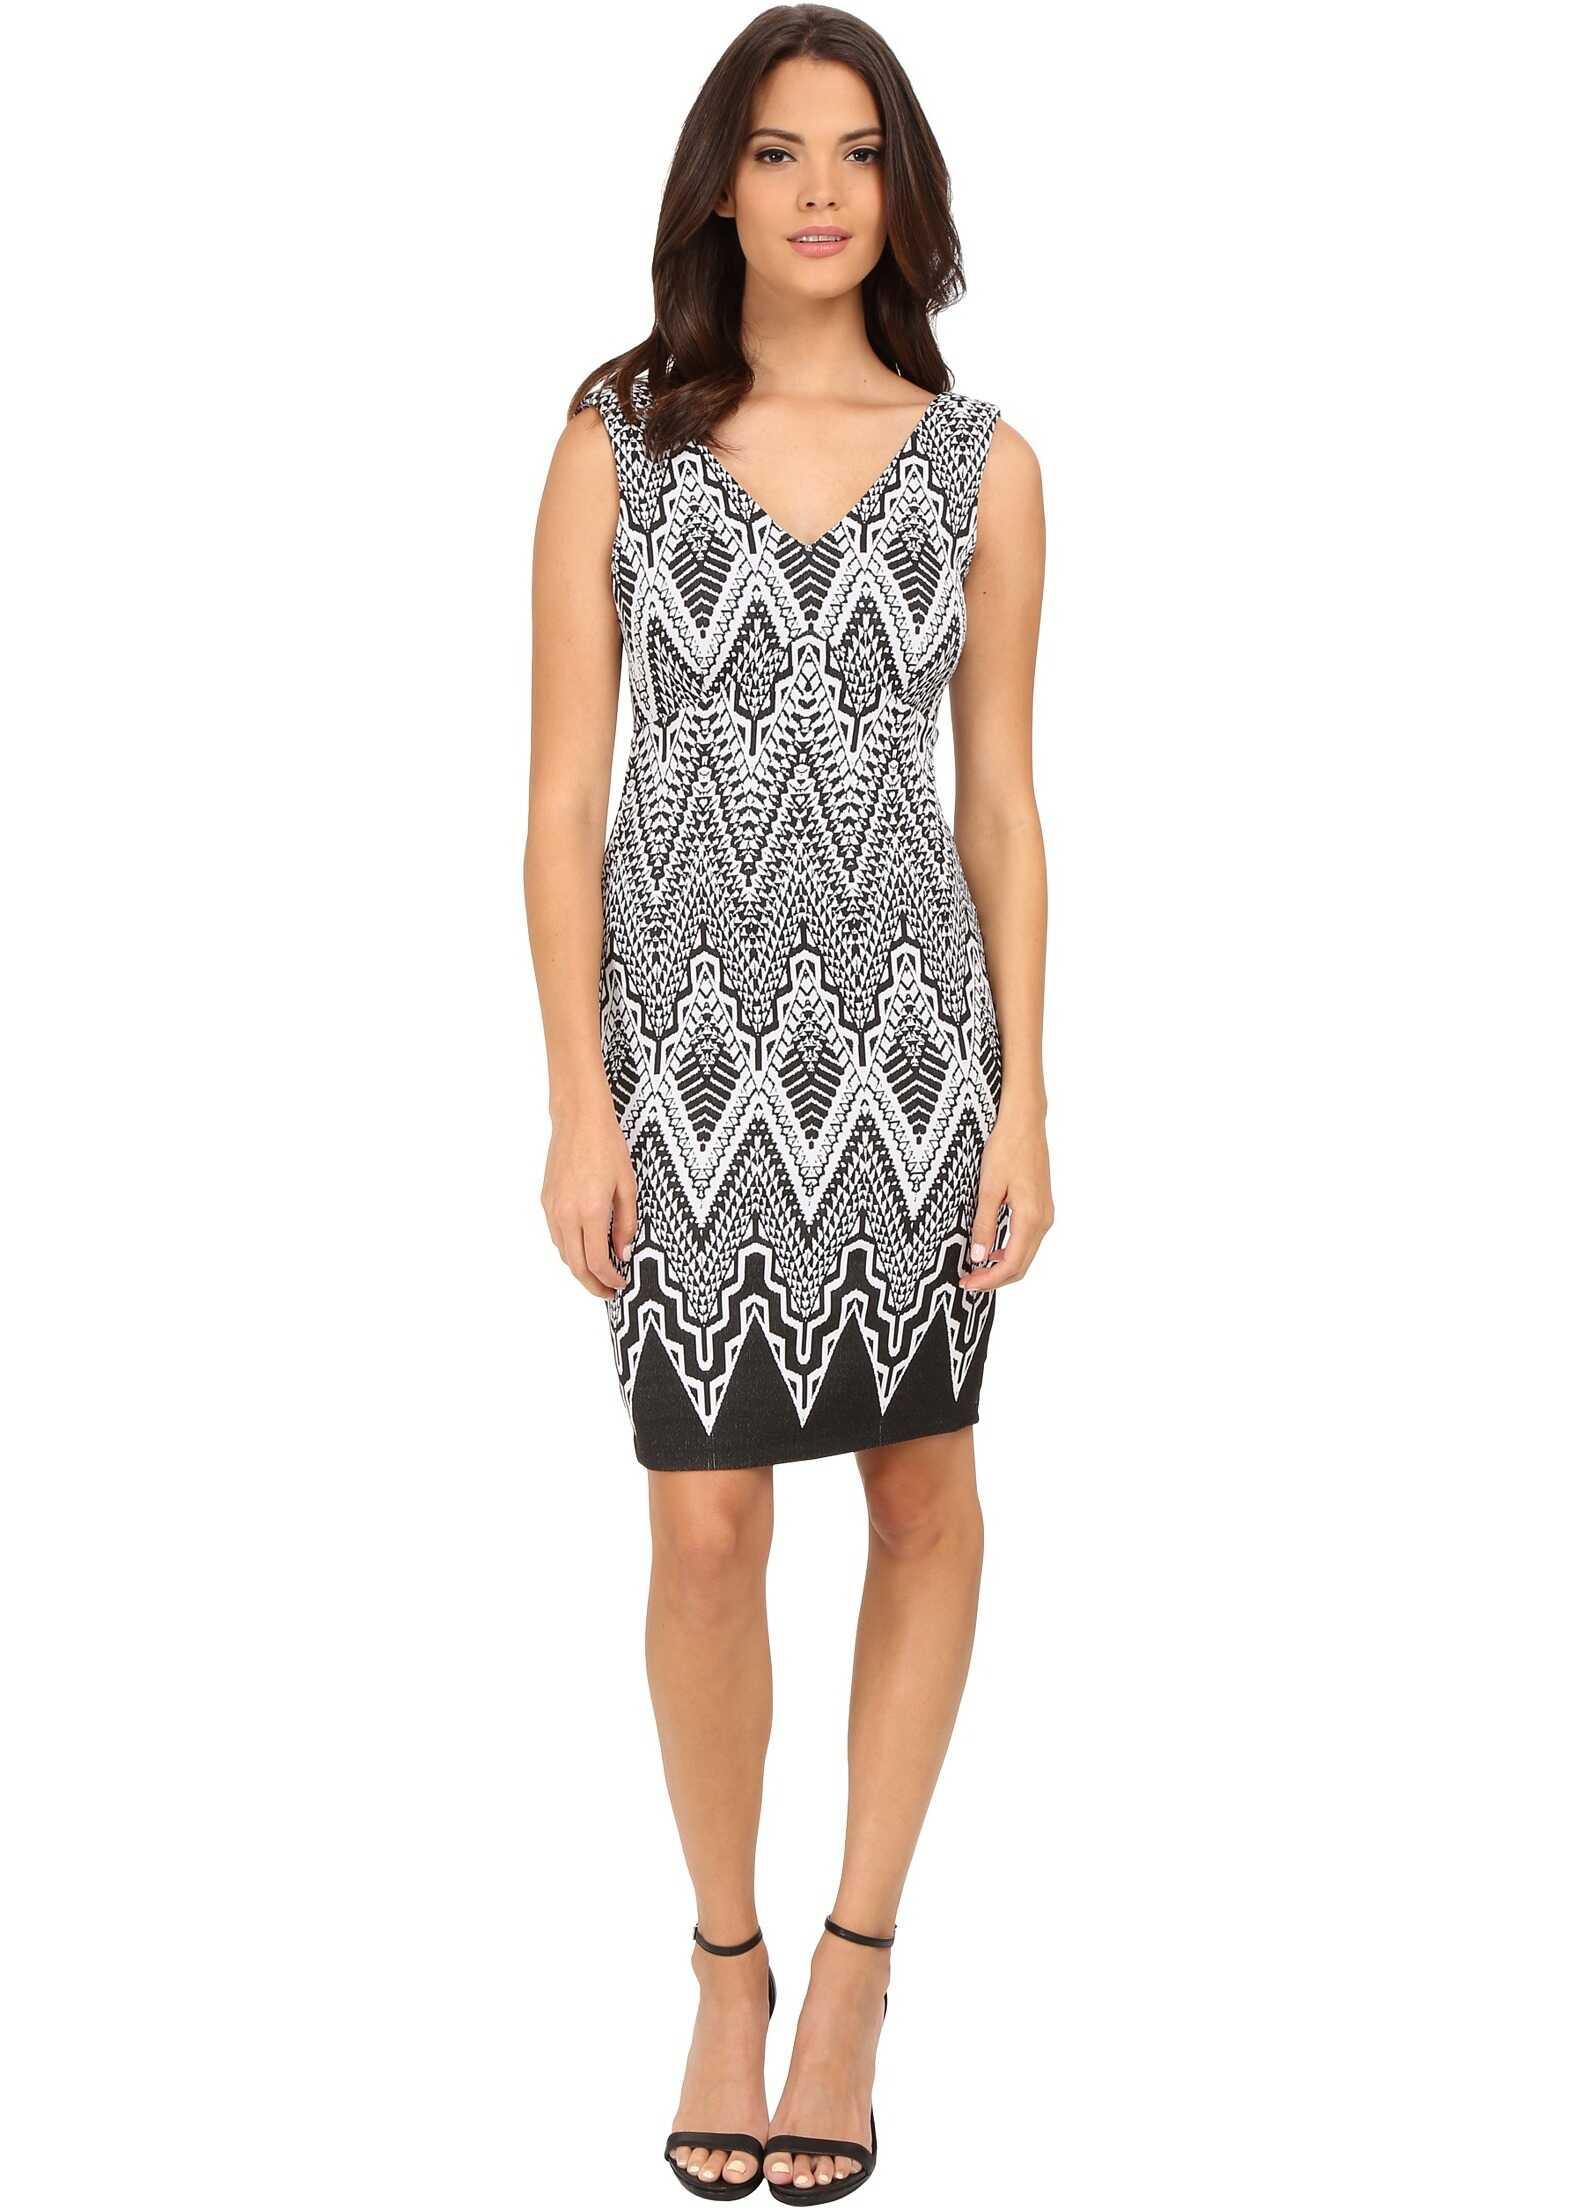 Calvin Klein V-Neck Printed Sheath Dress Black/Winter White